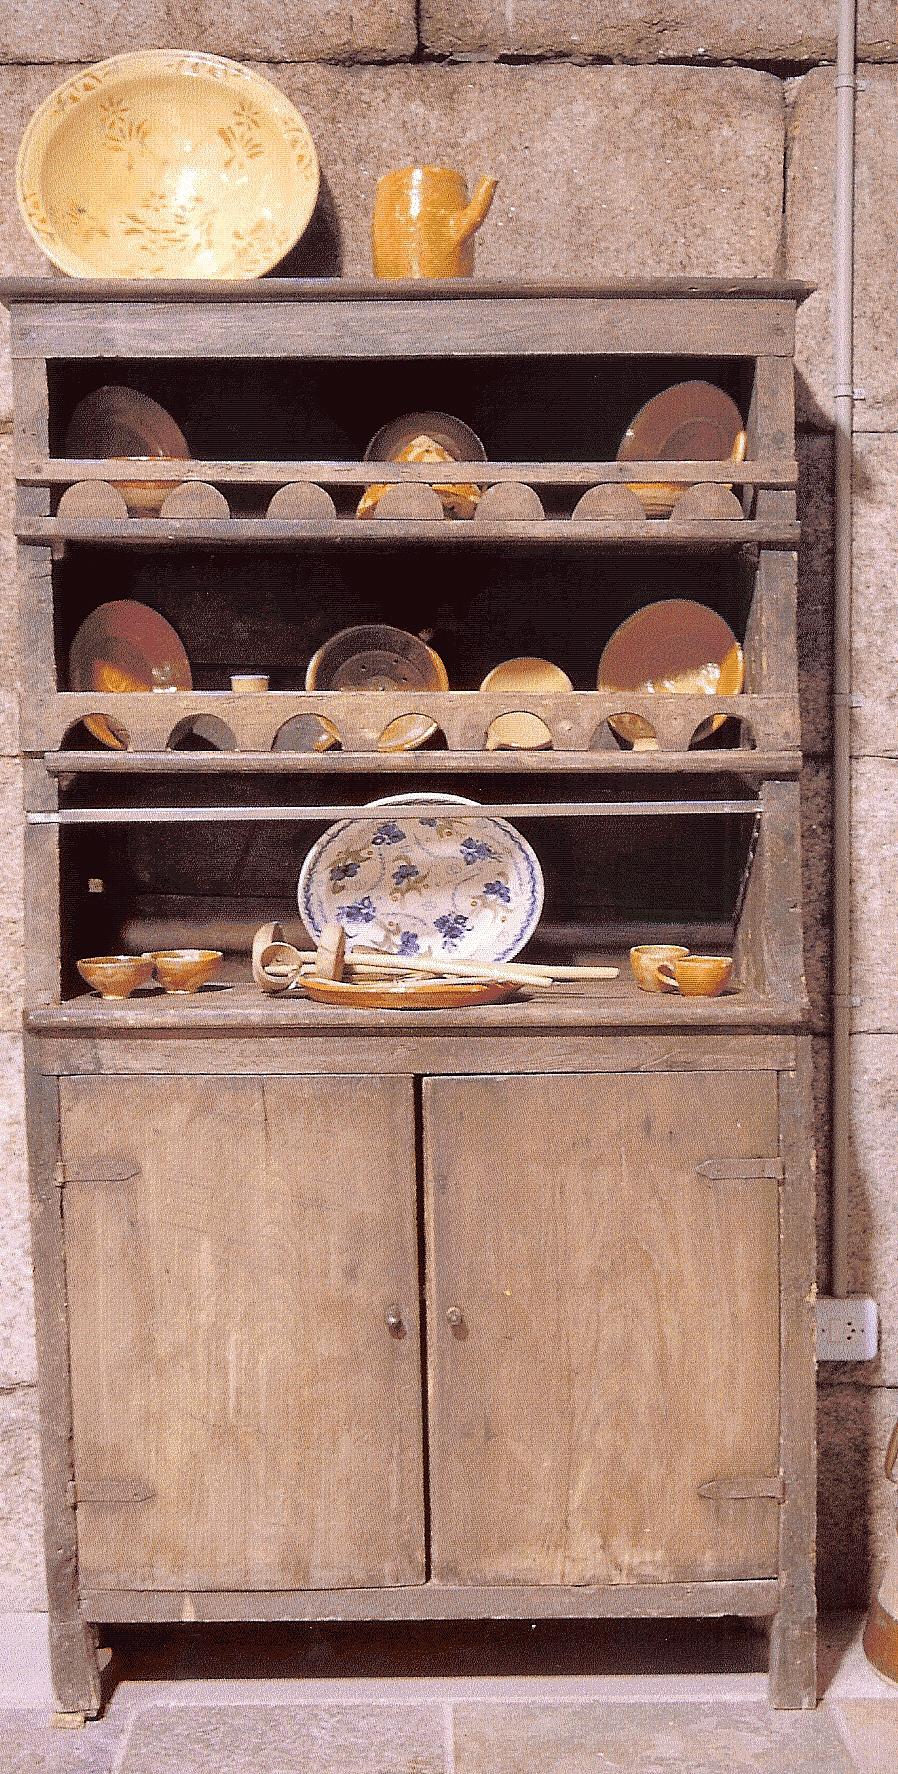 Alacenas de cocina antiguas dise os arquitect nicos for Cocinas de hierro antiguas